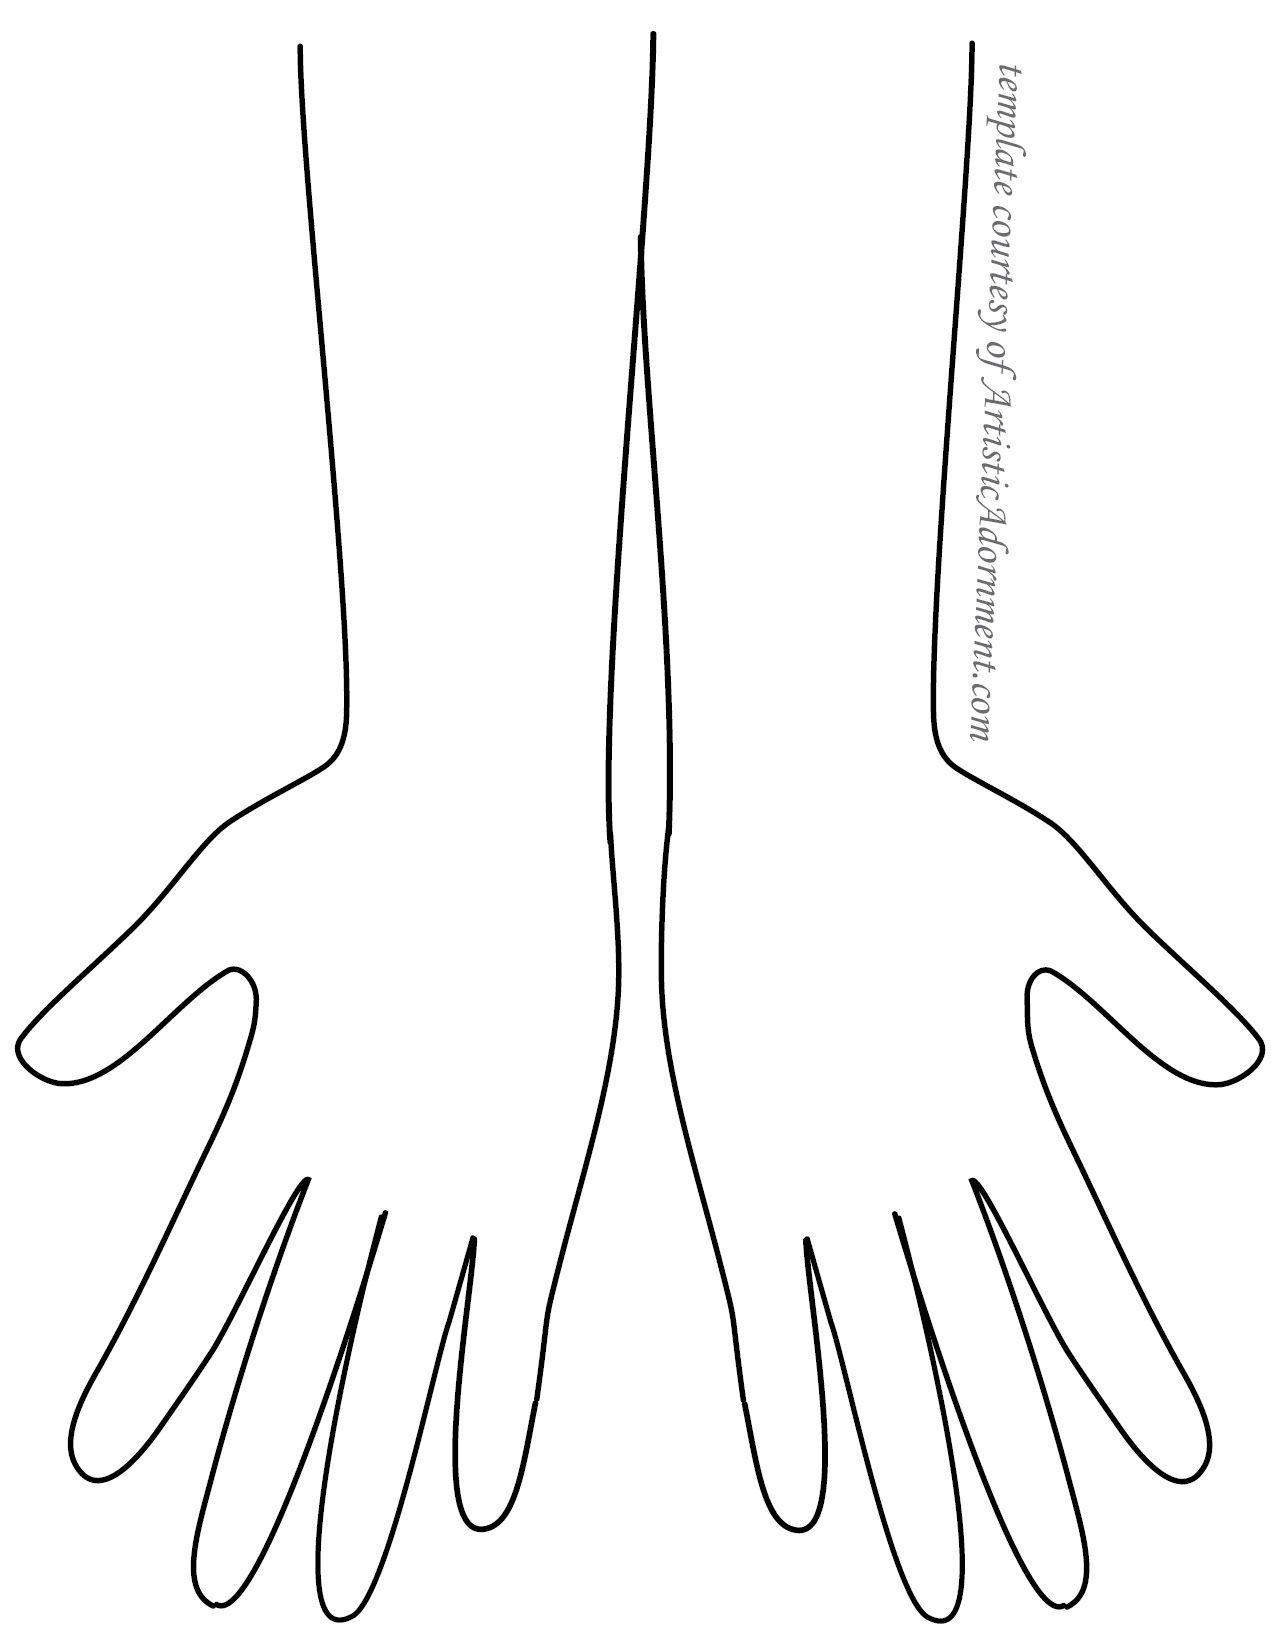 Henna Hand Template From Artisticadornment